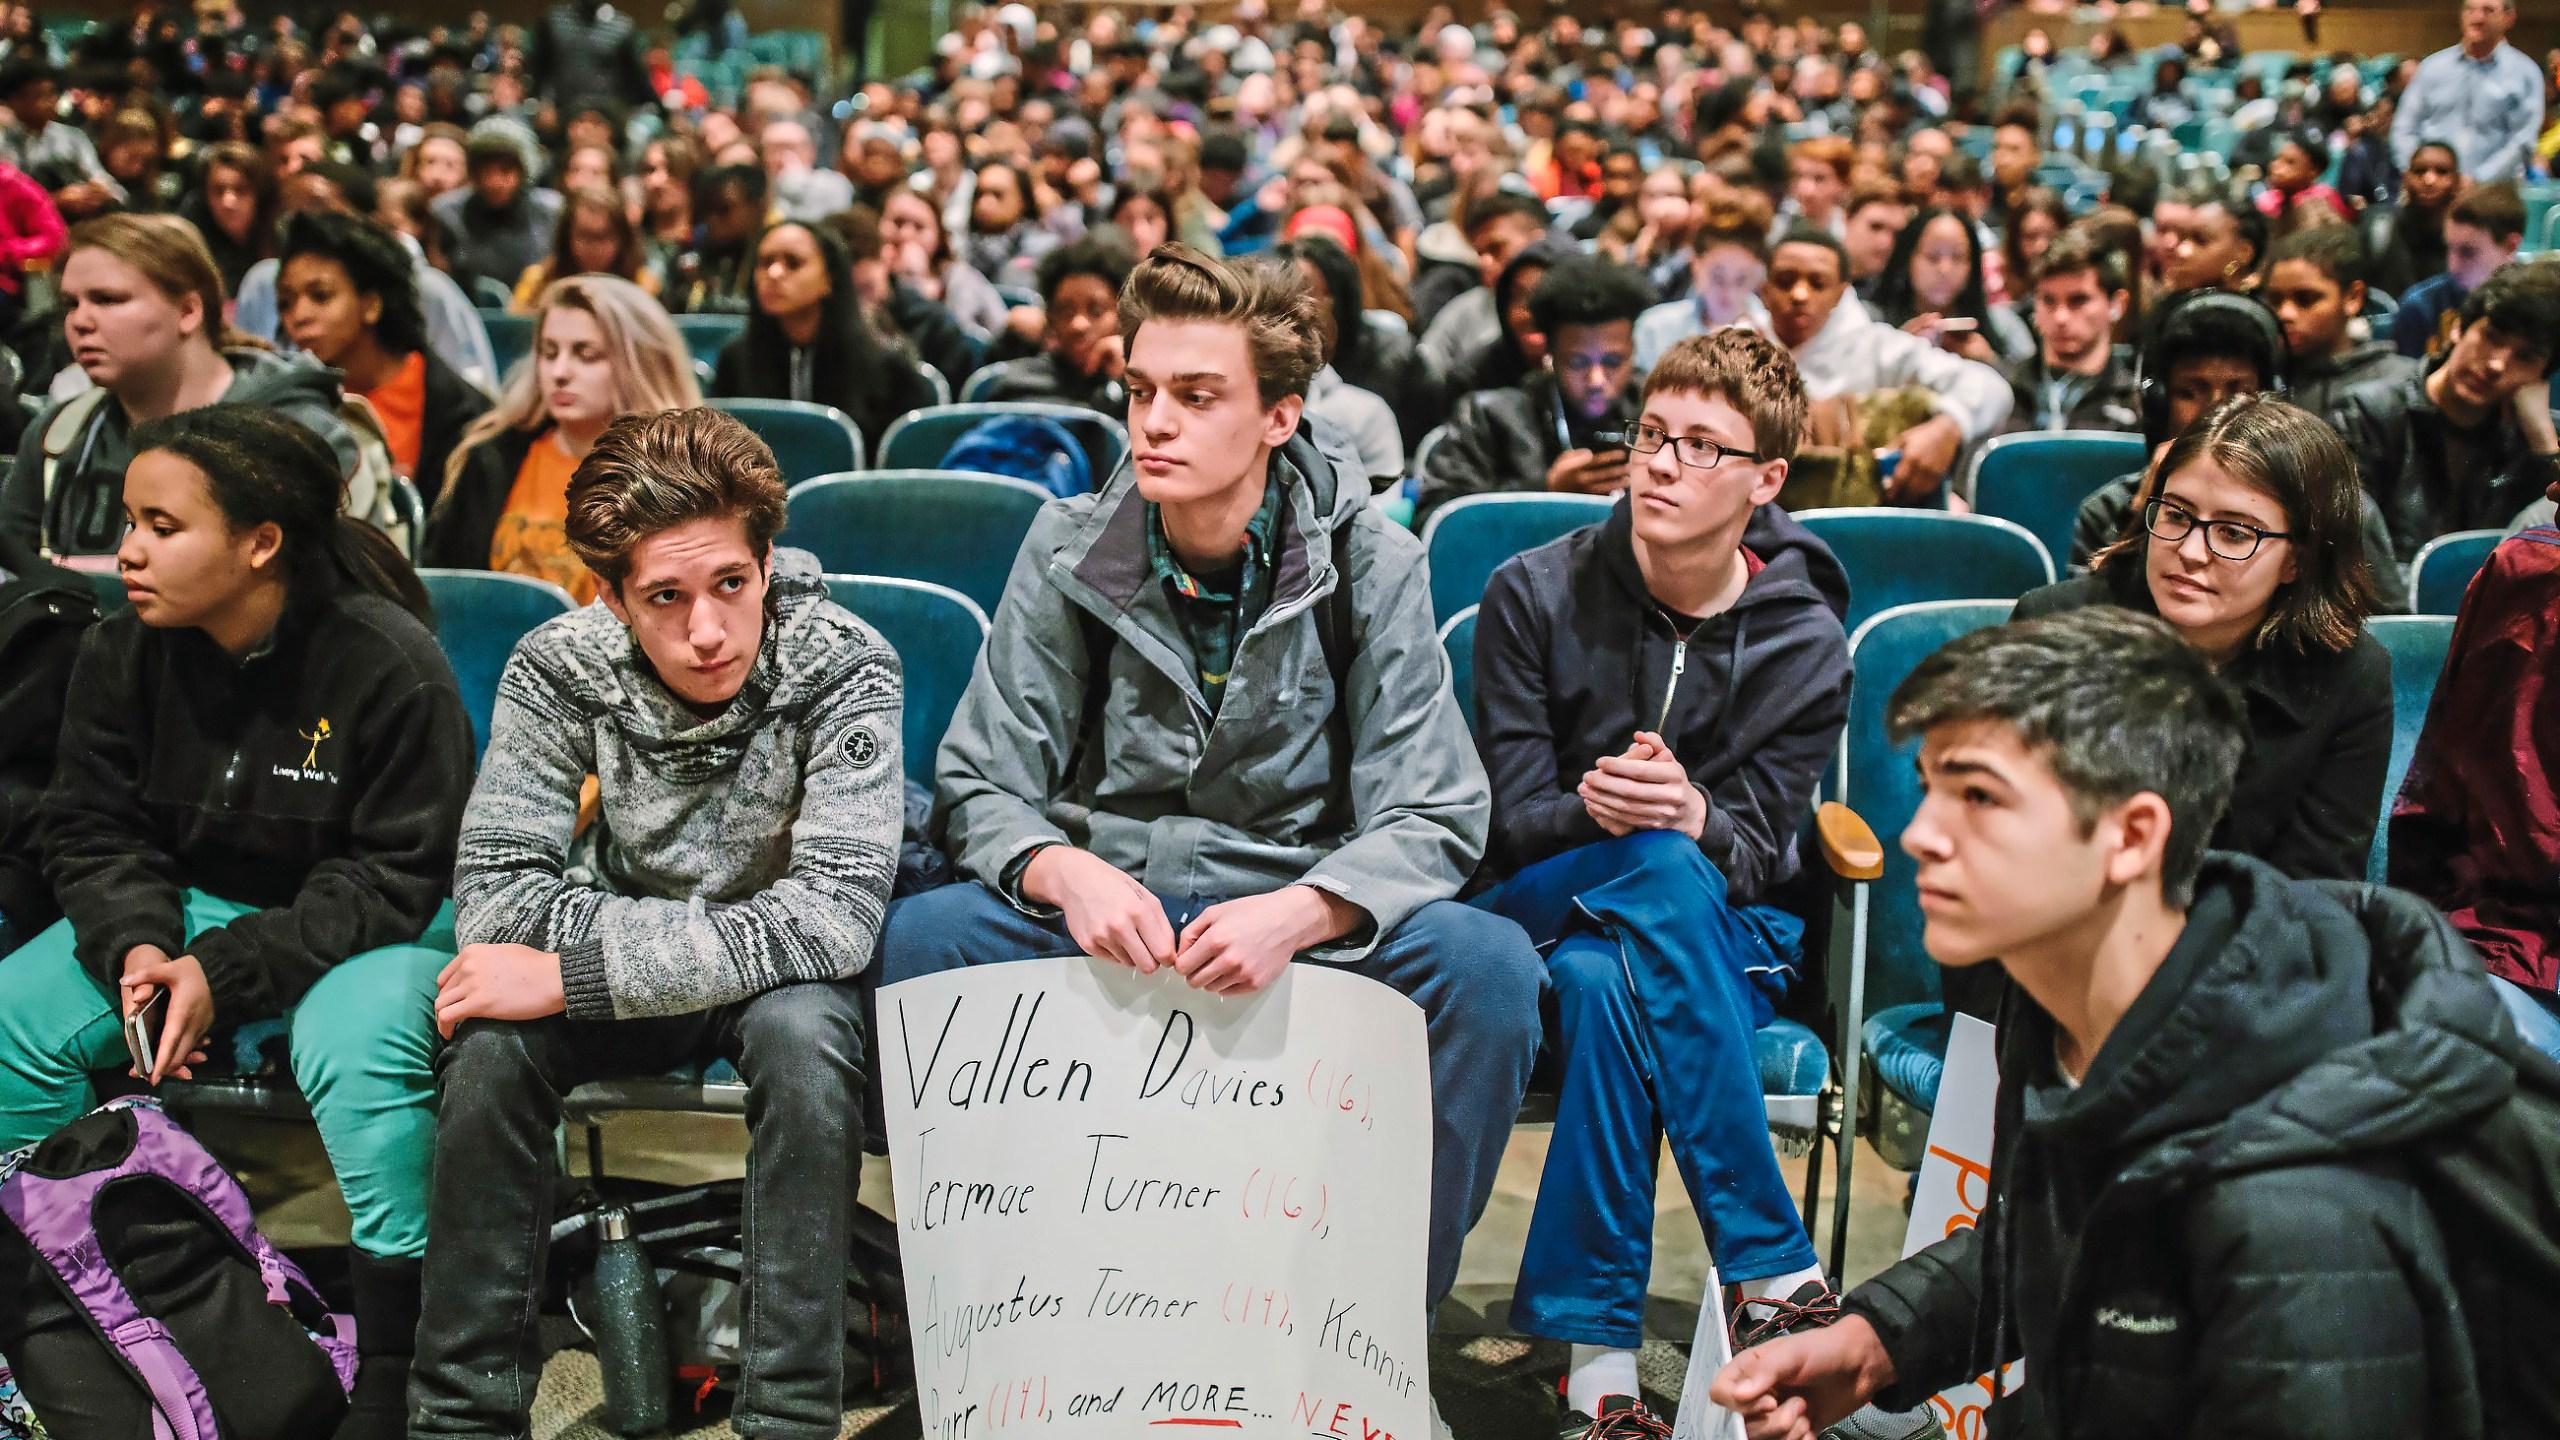 Student_Walkouts_Gun_Violence_Pennsylvania_30288-159532.jpg96143578